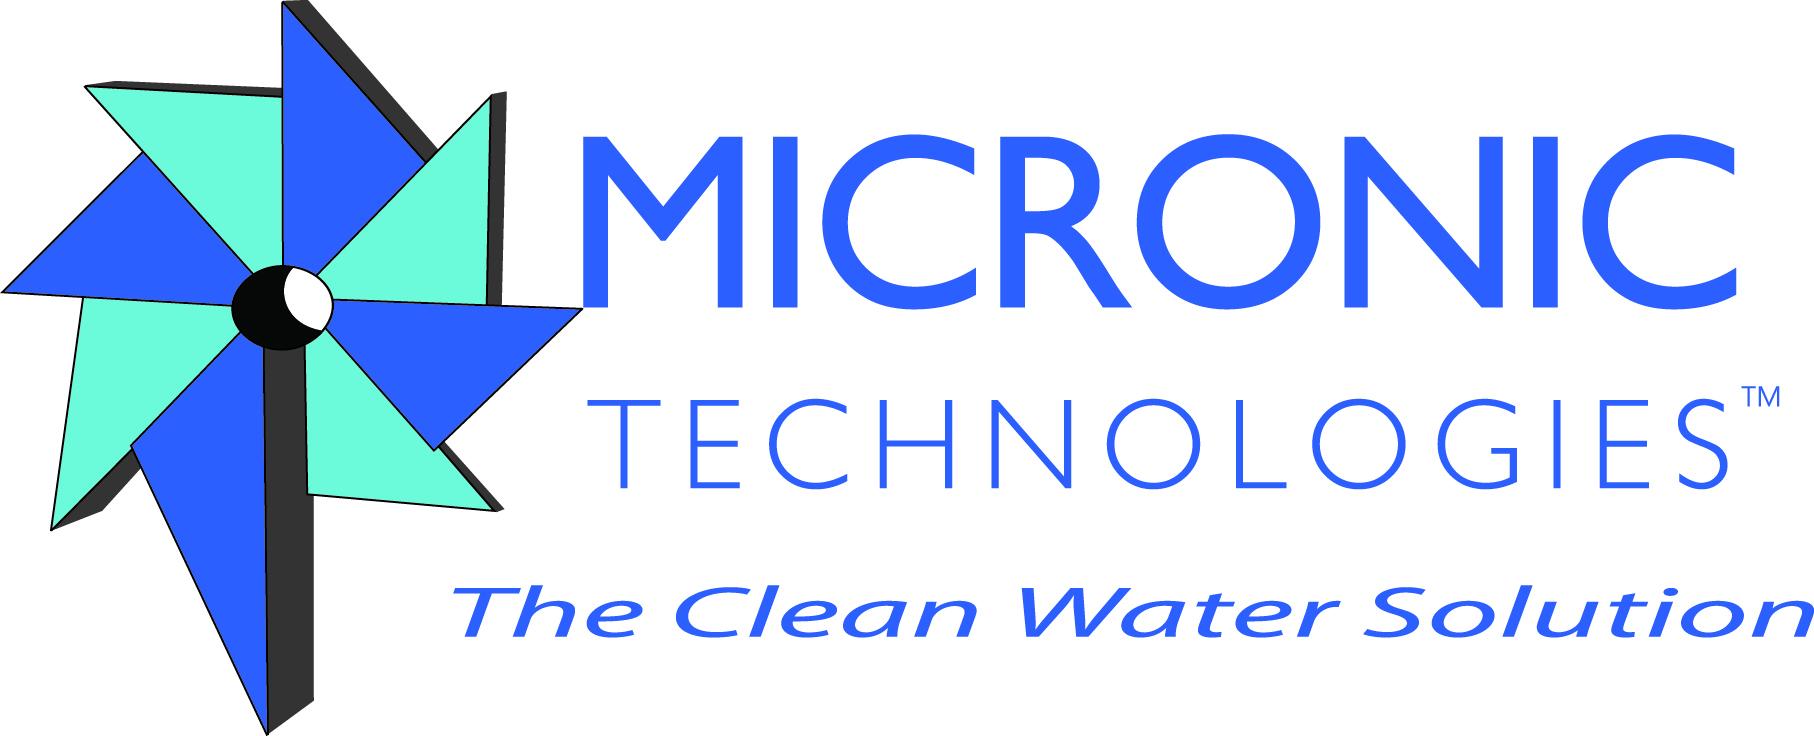 Micronic Logo.jpg